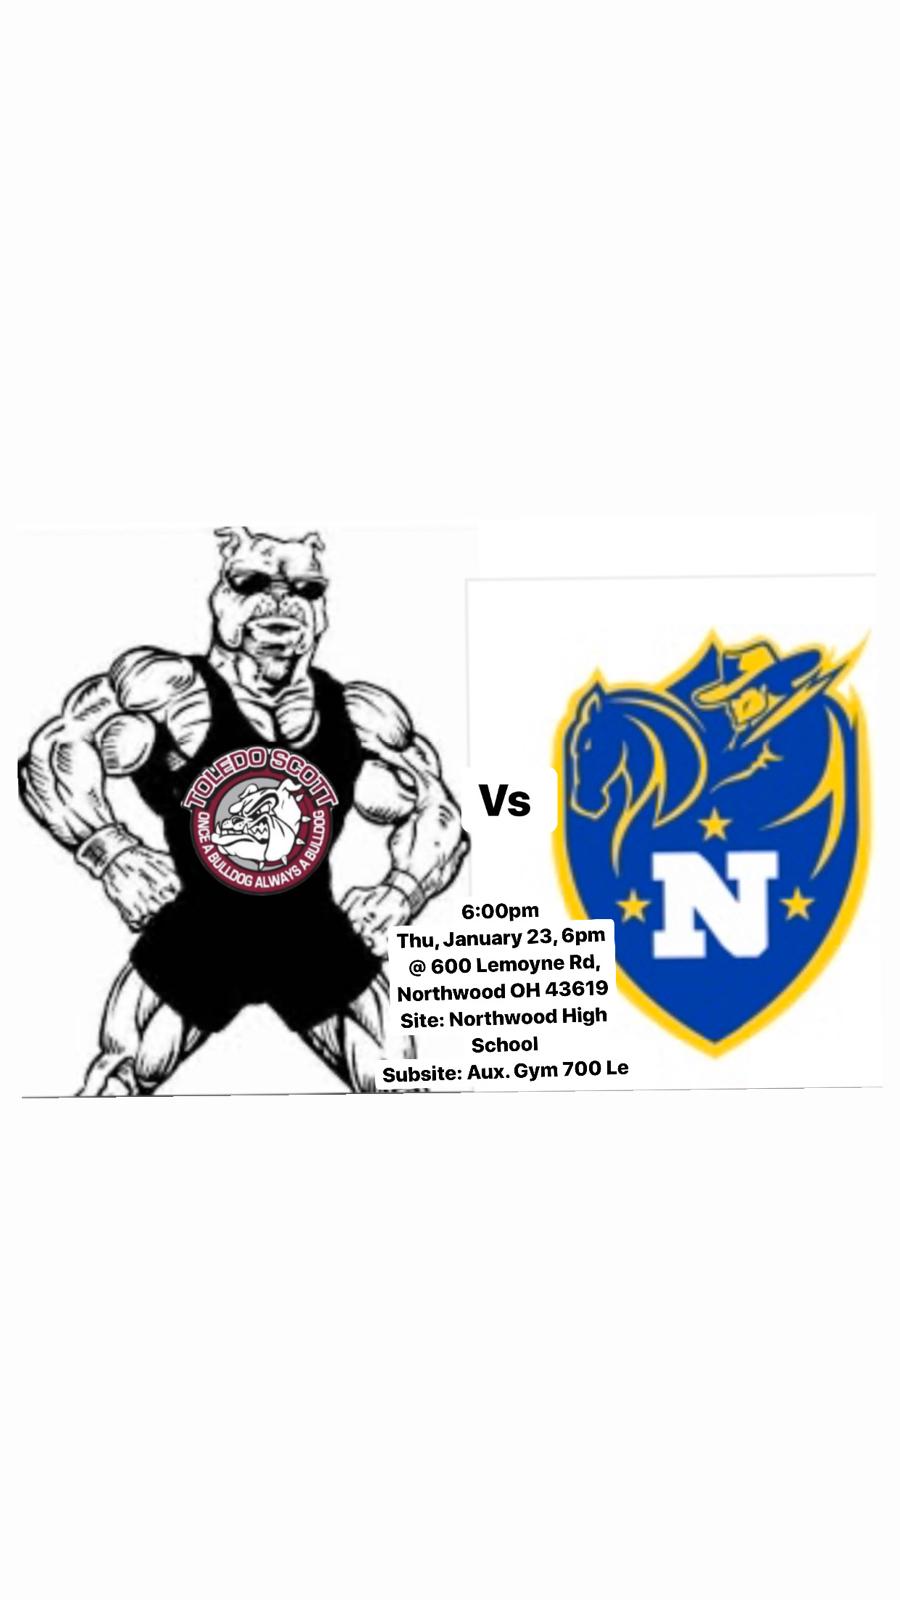 Scott, Bowsher, and Northwood (Tri wrestling match 6-8pm)